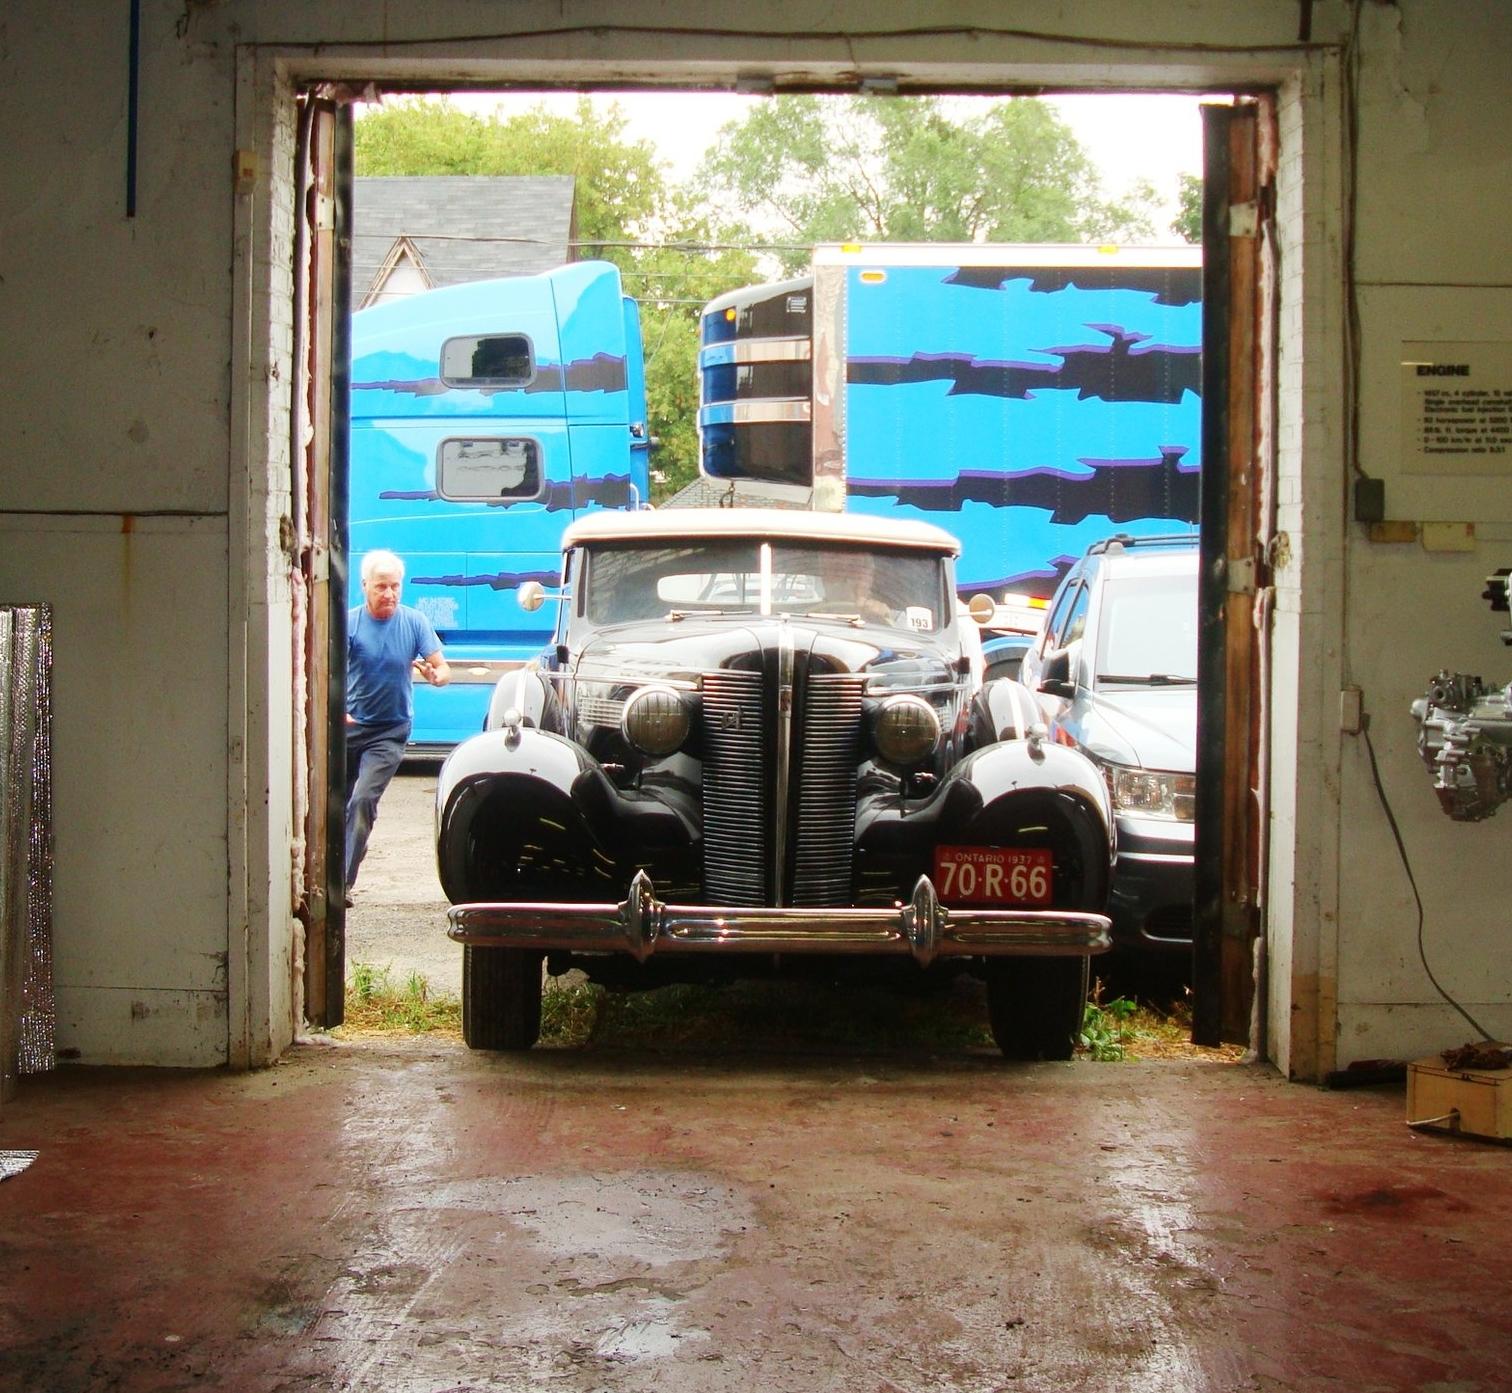 Buick loading dock